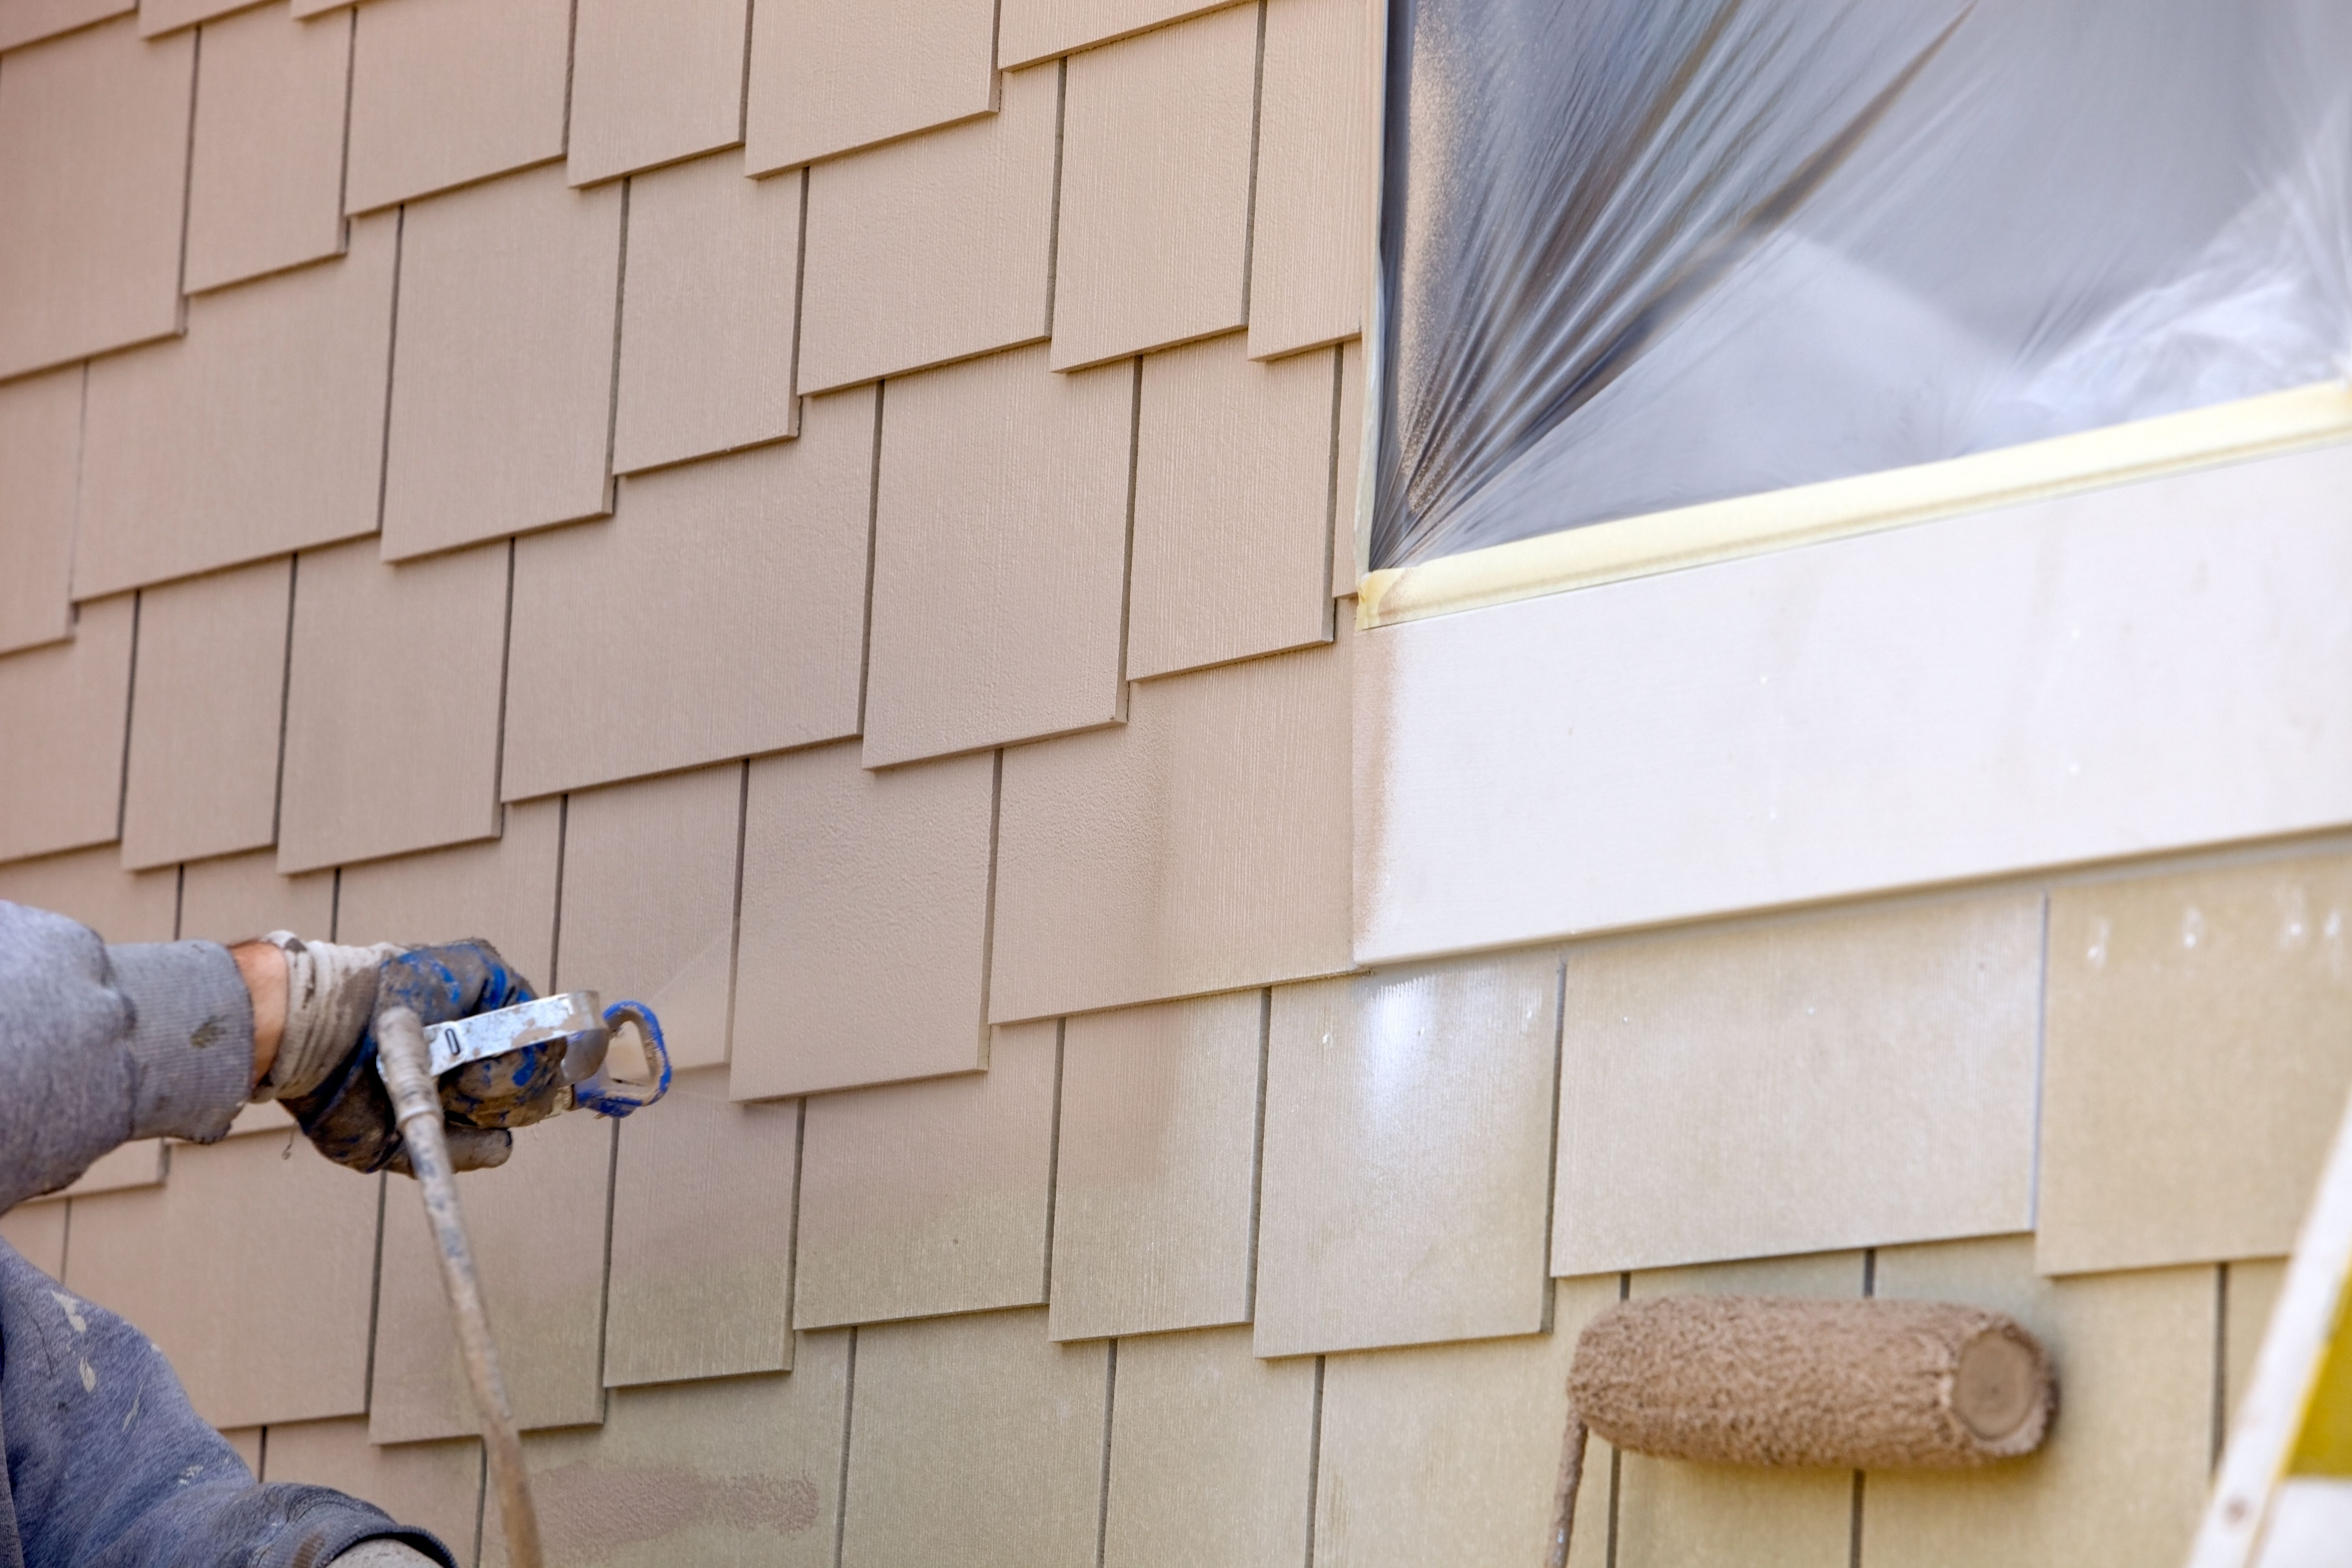 How to use a paint sprayer - Paint sprayer for house exterior ...